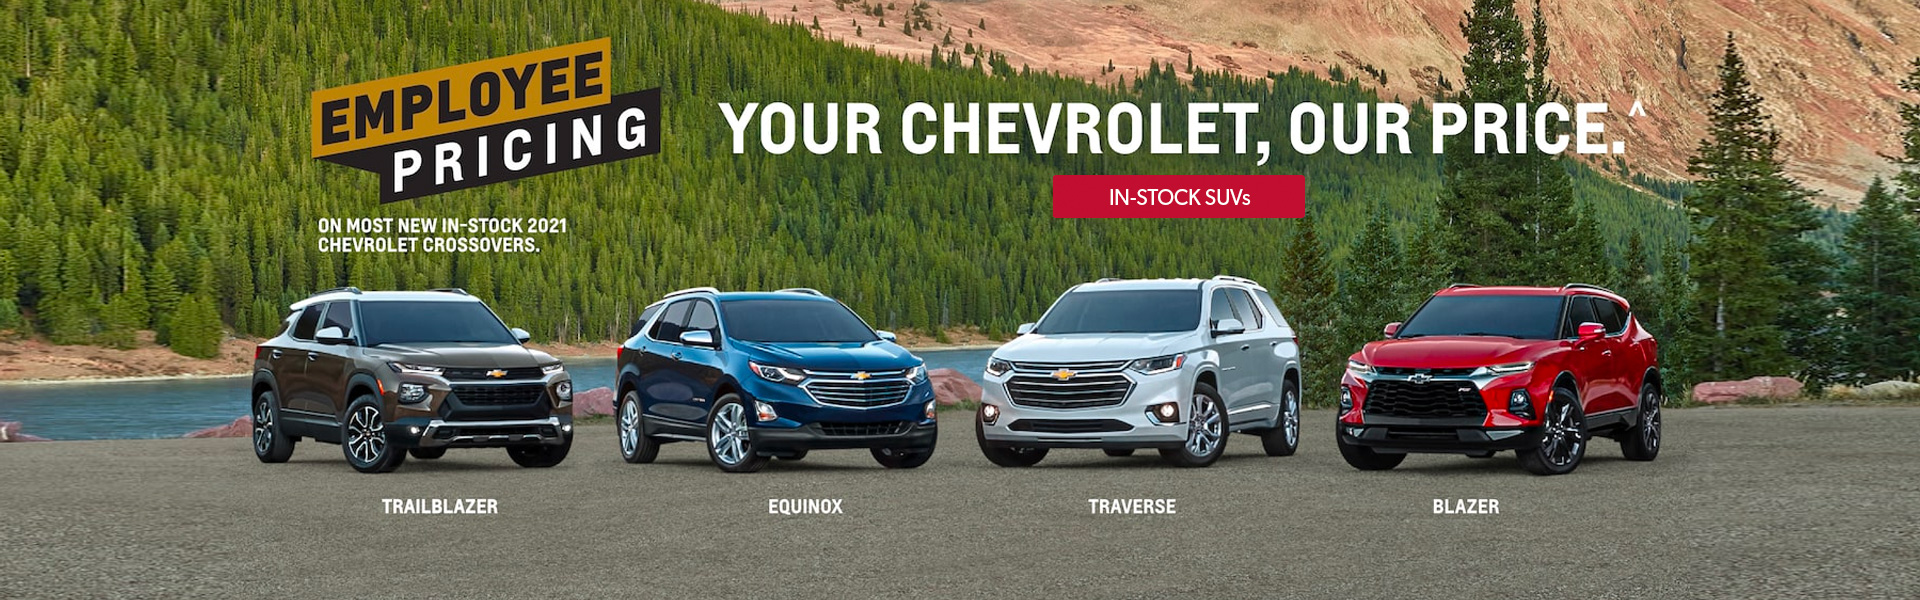 Chevrolet Dealer Ontario